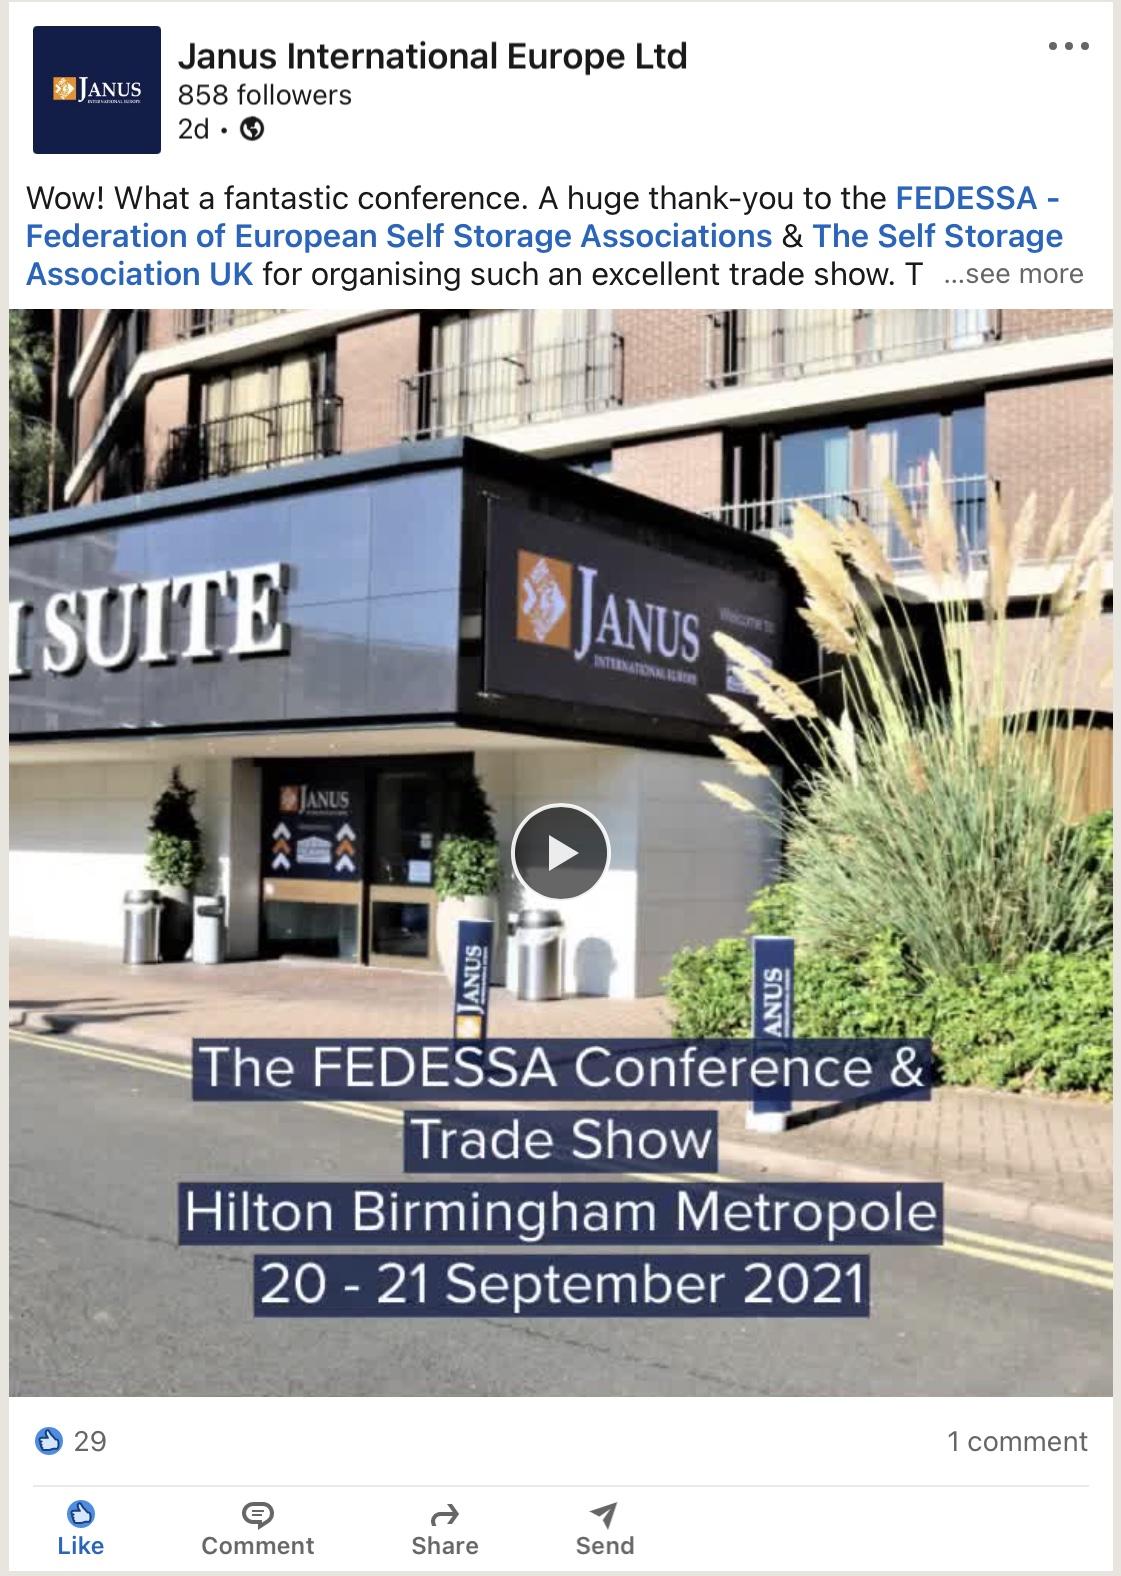 Fedessa Conference